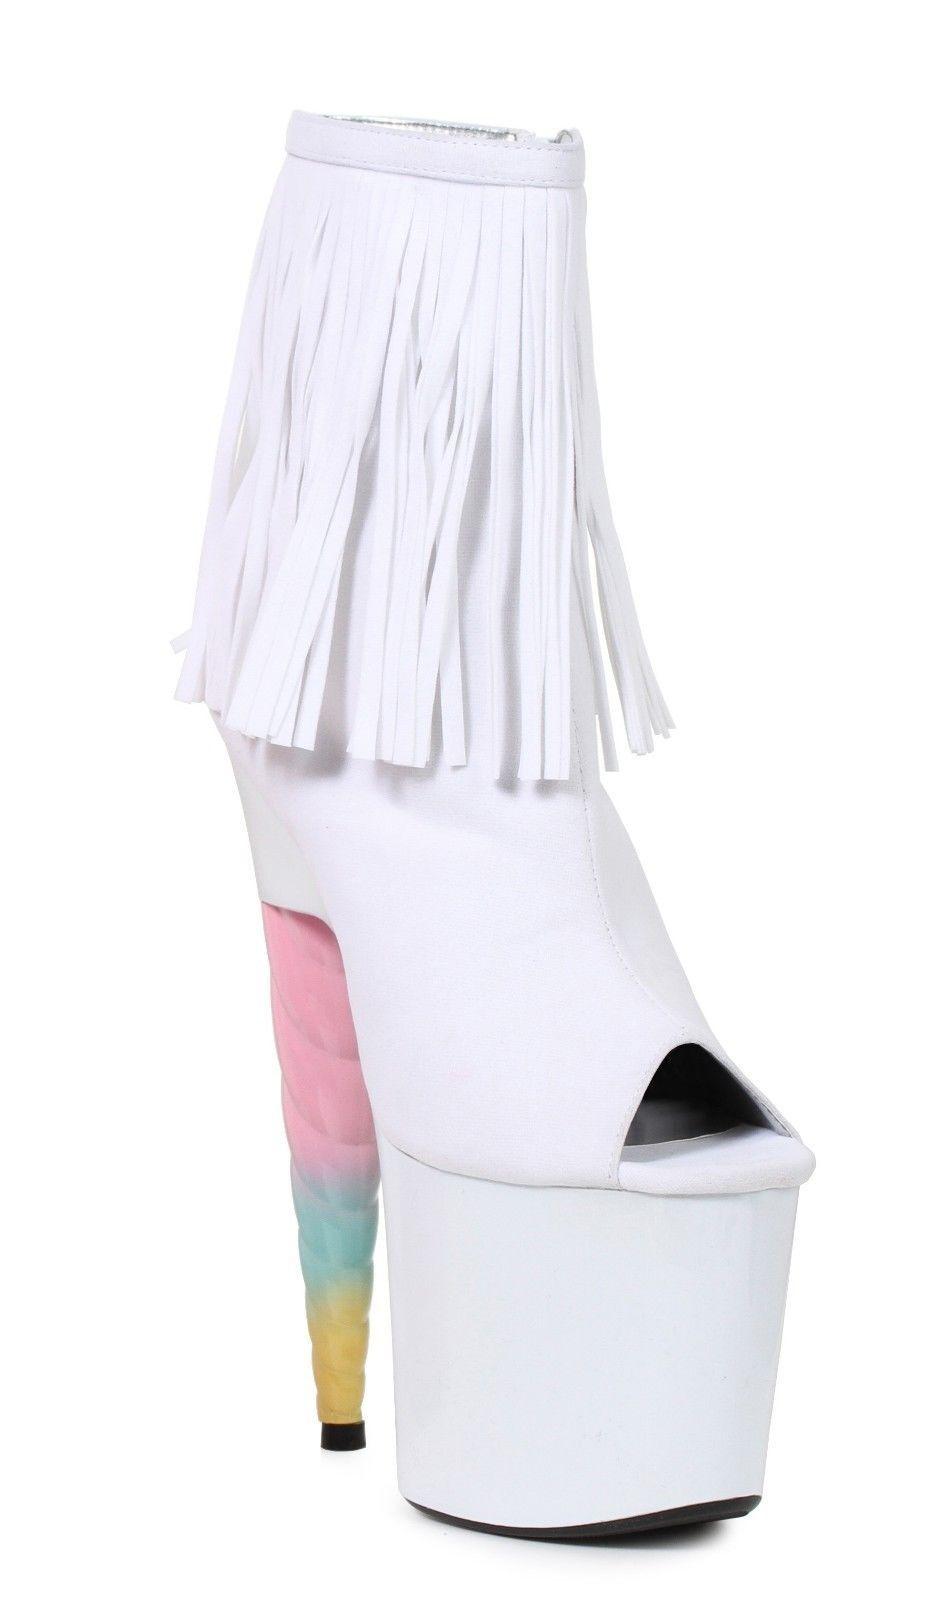 7  Weiß Unicorn Heels My Little Pony schuhe Cosplay Cosplay schuhe Costume Heels Stripper Stiefel a65200